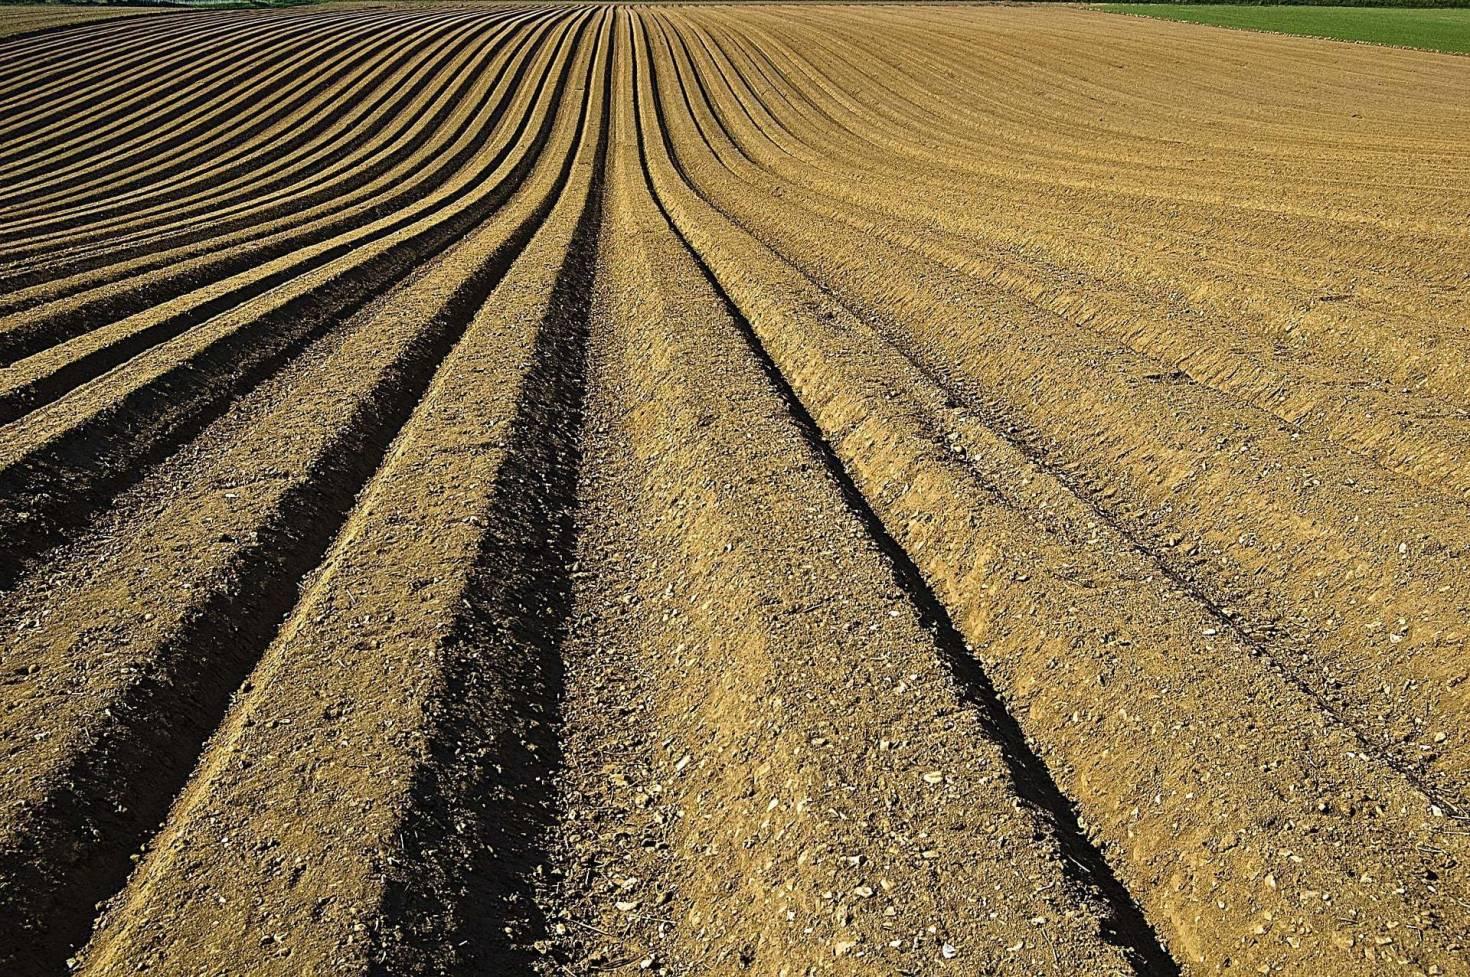 Furrowed Farm Land